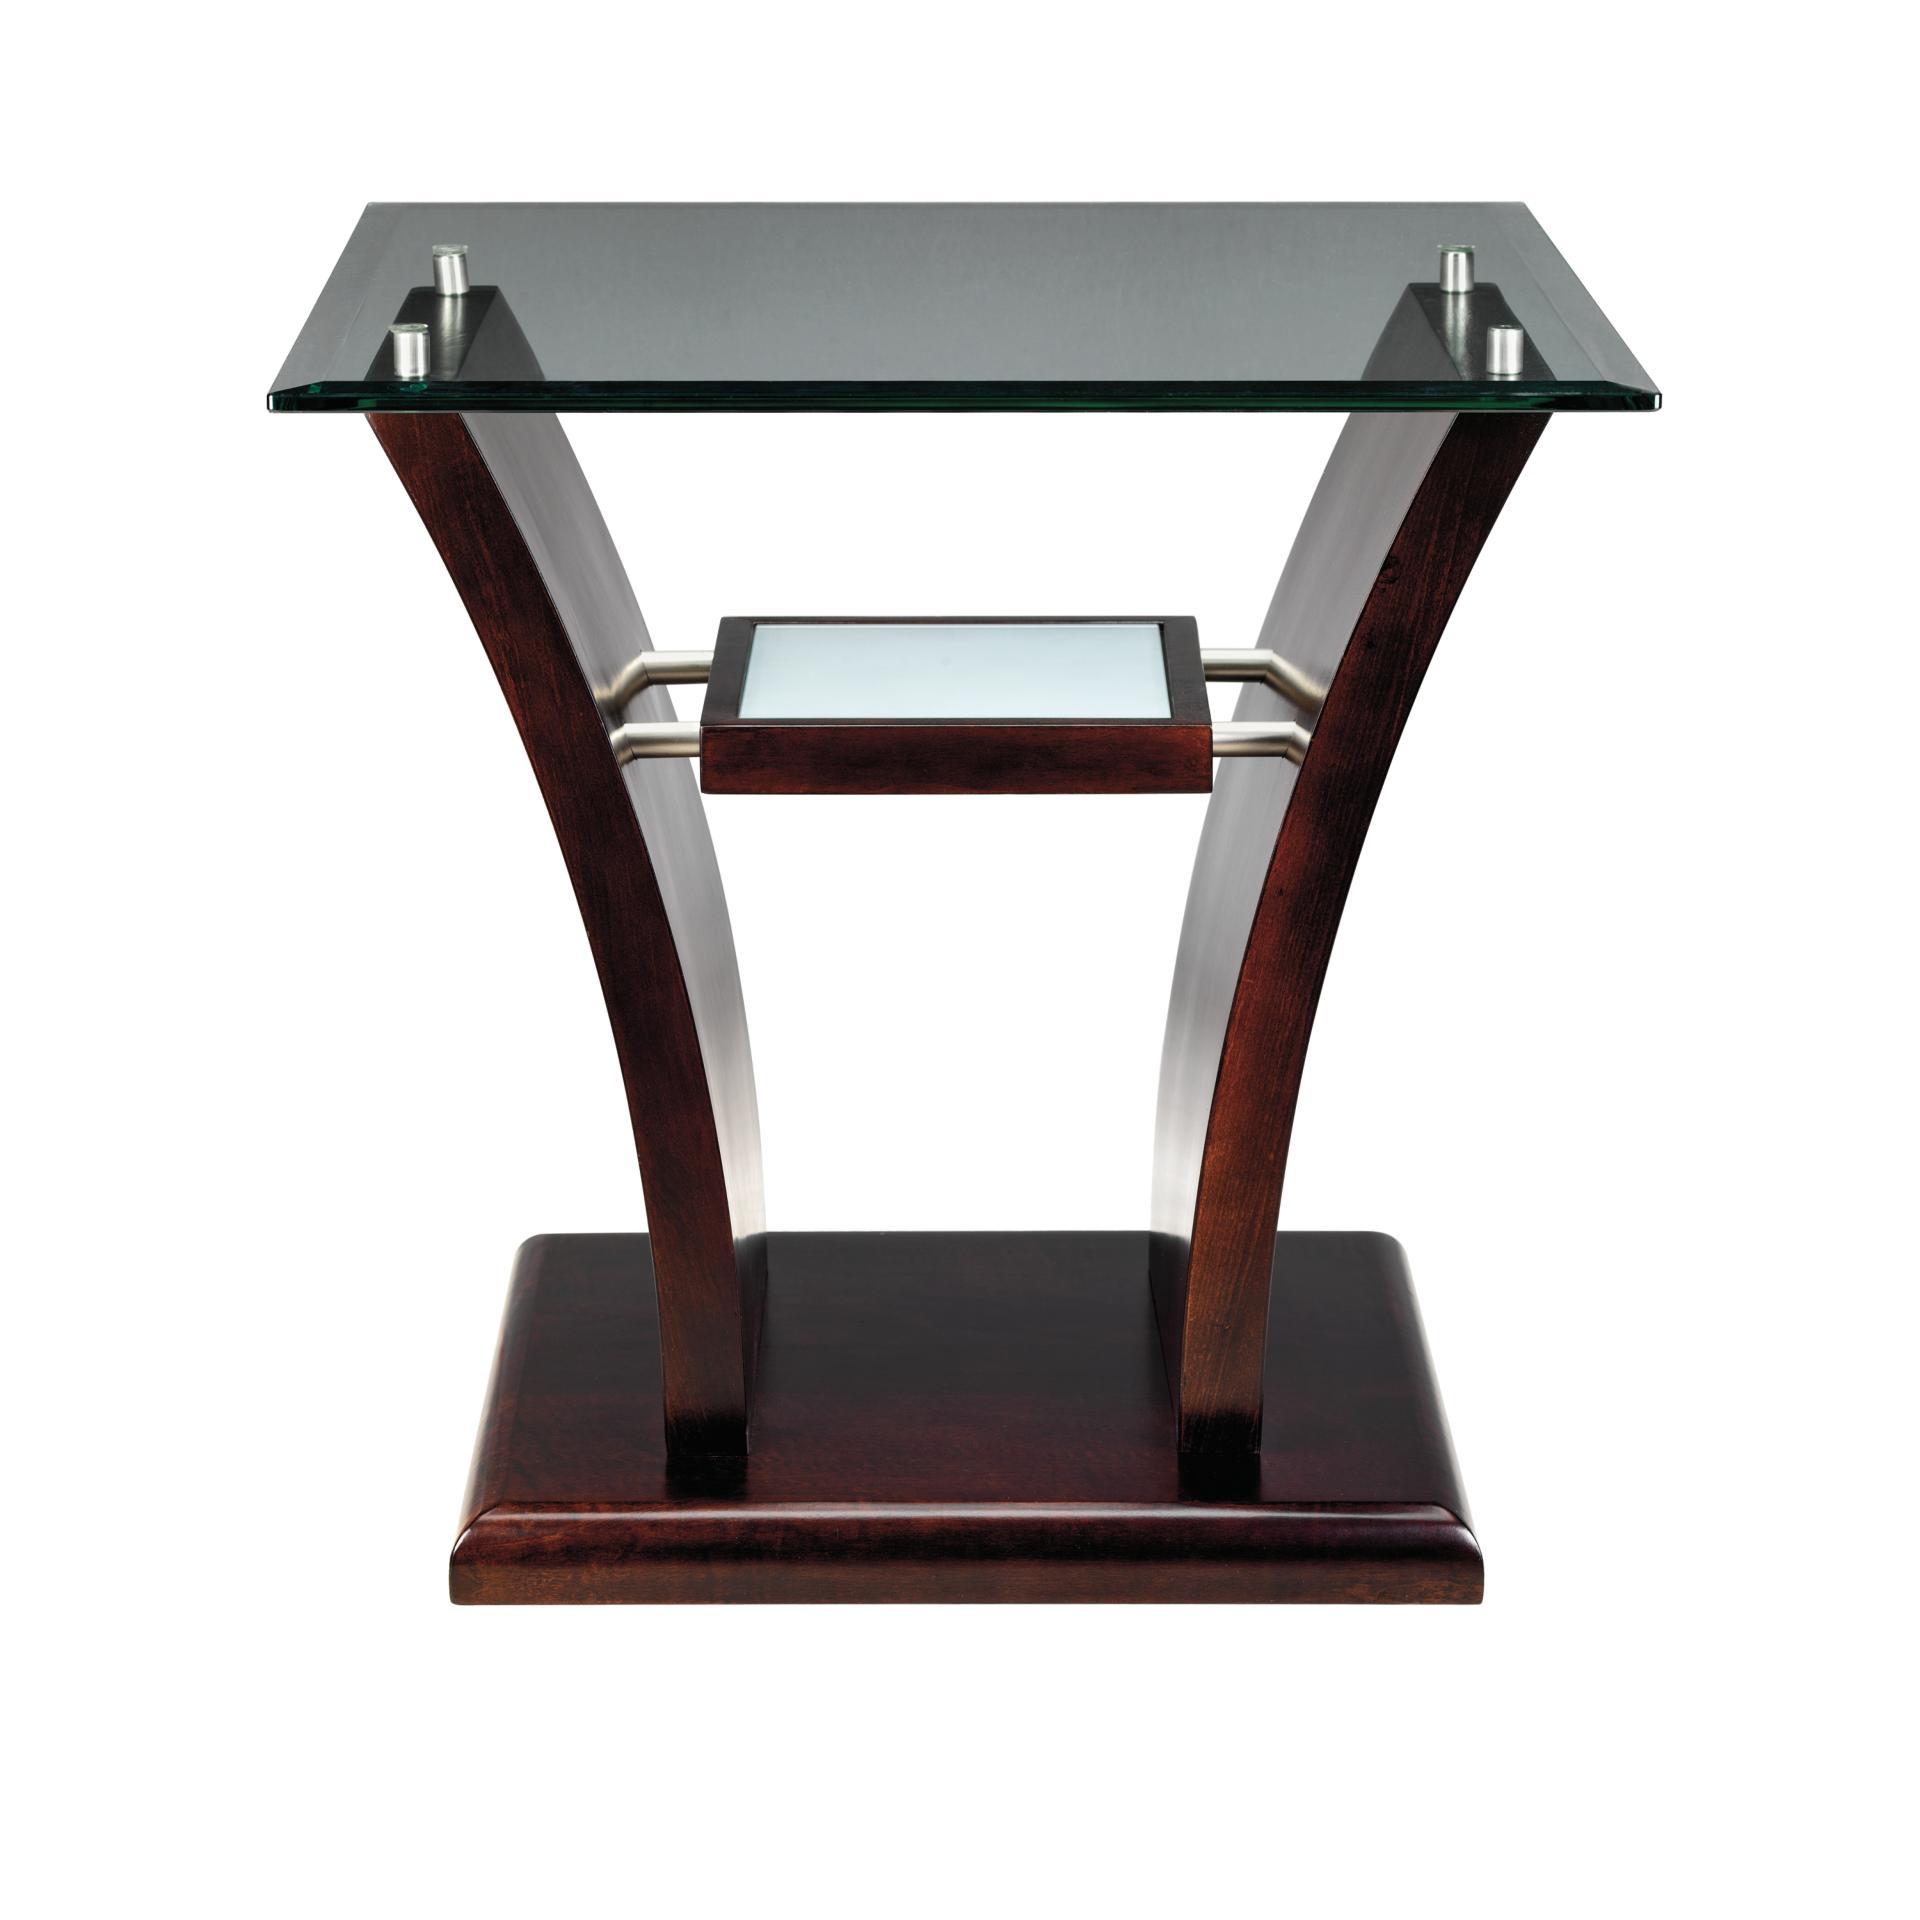 stickley sterling sofa table grey dark brown floor value city furniture heights mi 48312 bell aer end merlot